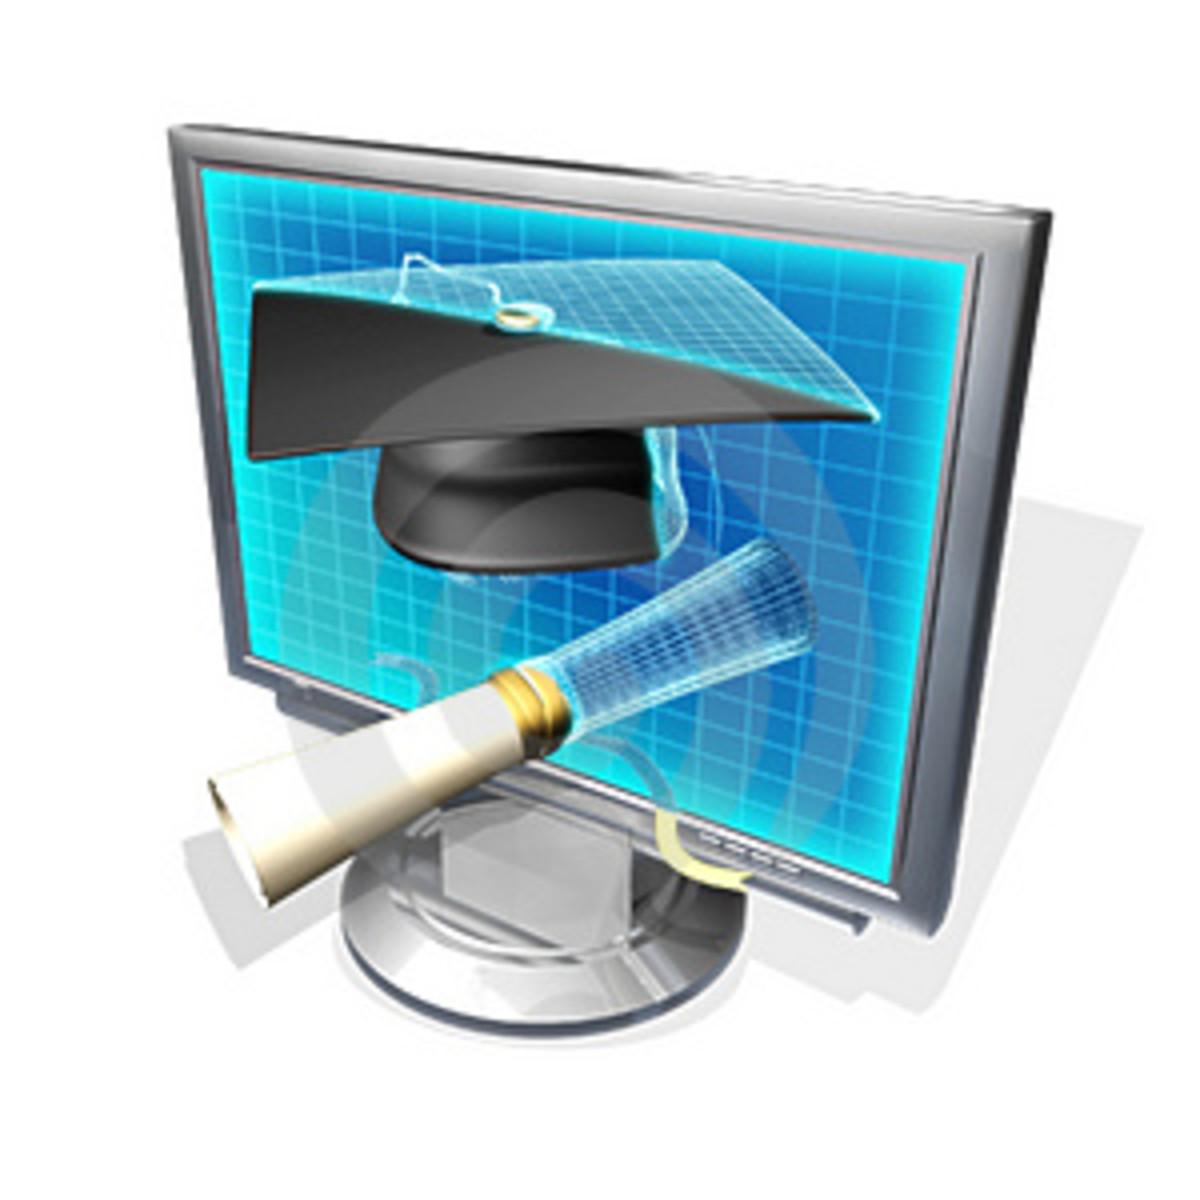 Internet Maarketing Education